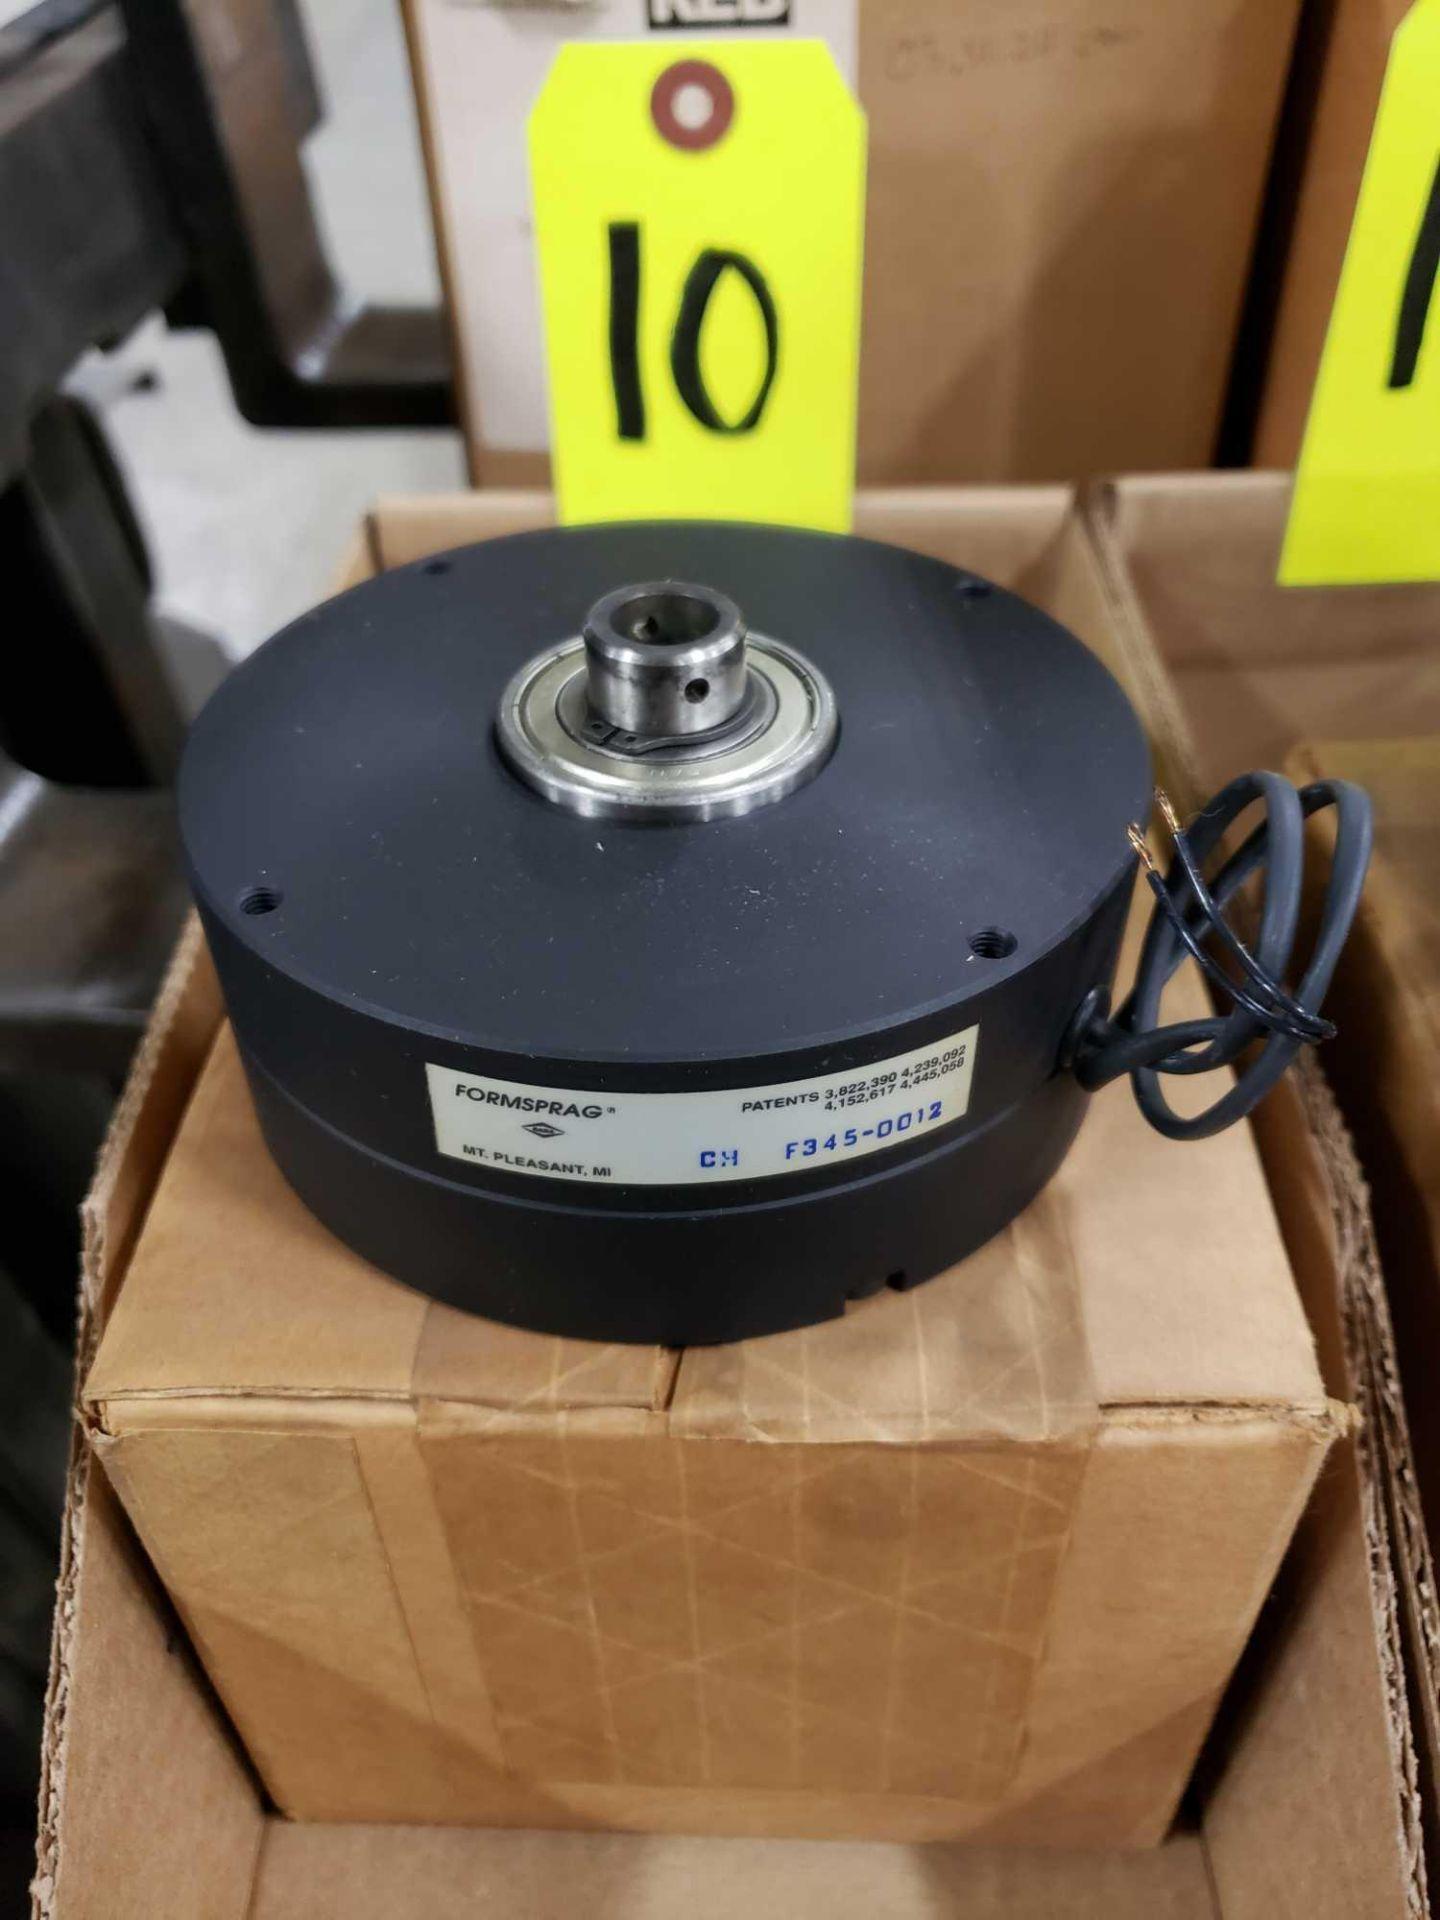 Lot 10 - Formsprag Magpowr sofstep model PSB-70/90V magnetic partical clutch brake. New in box.